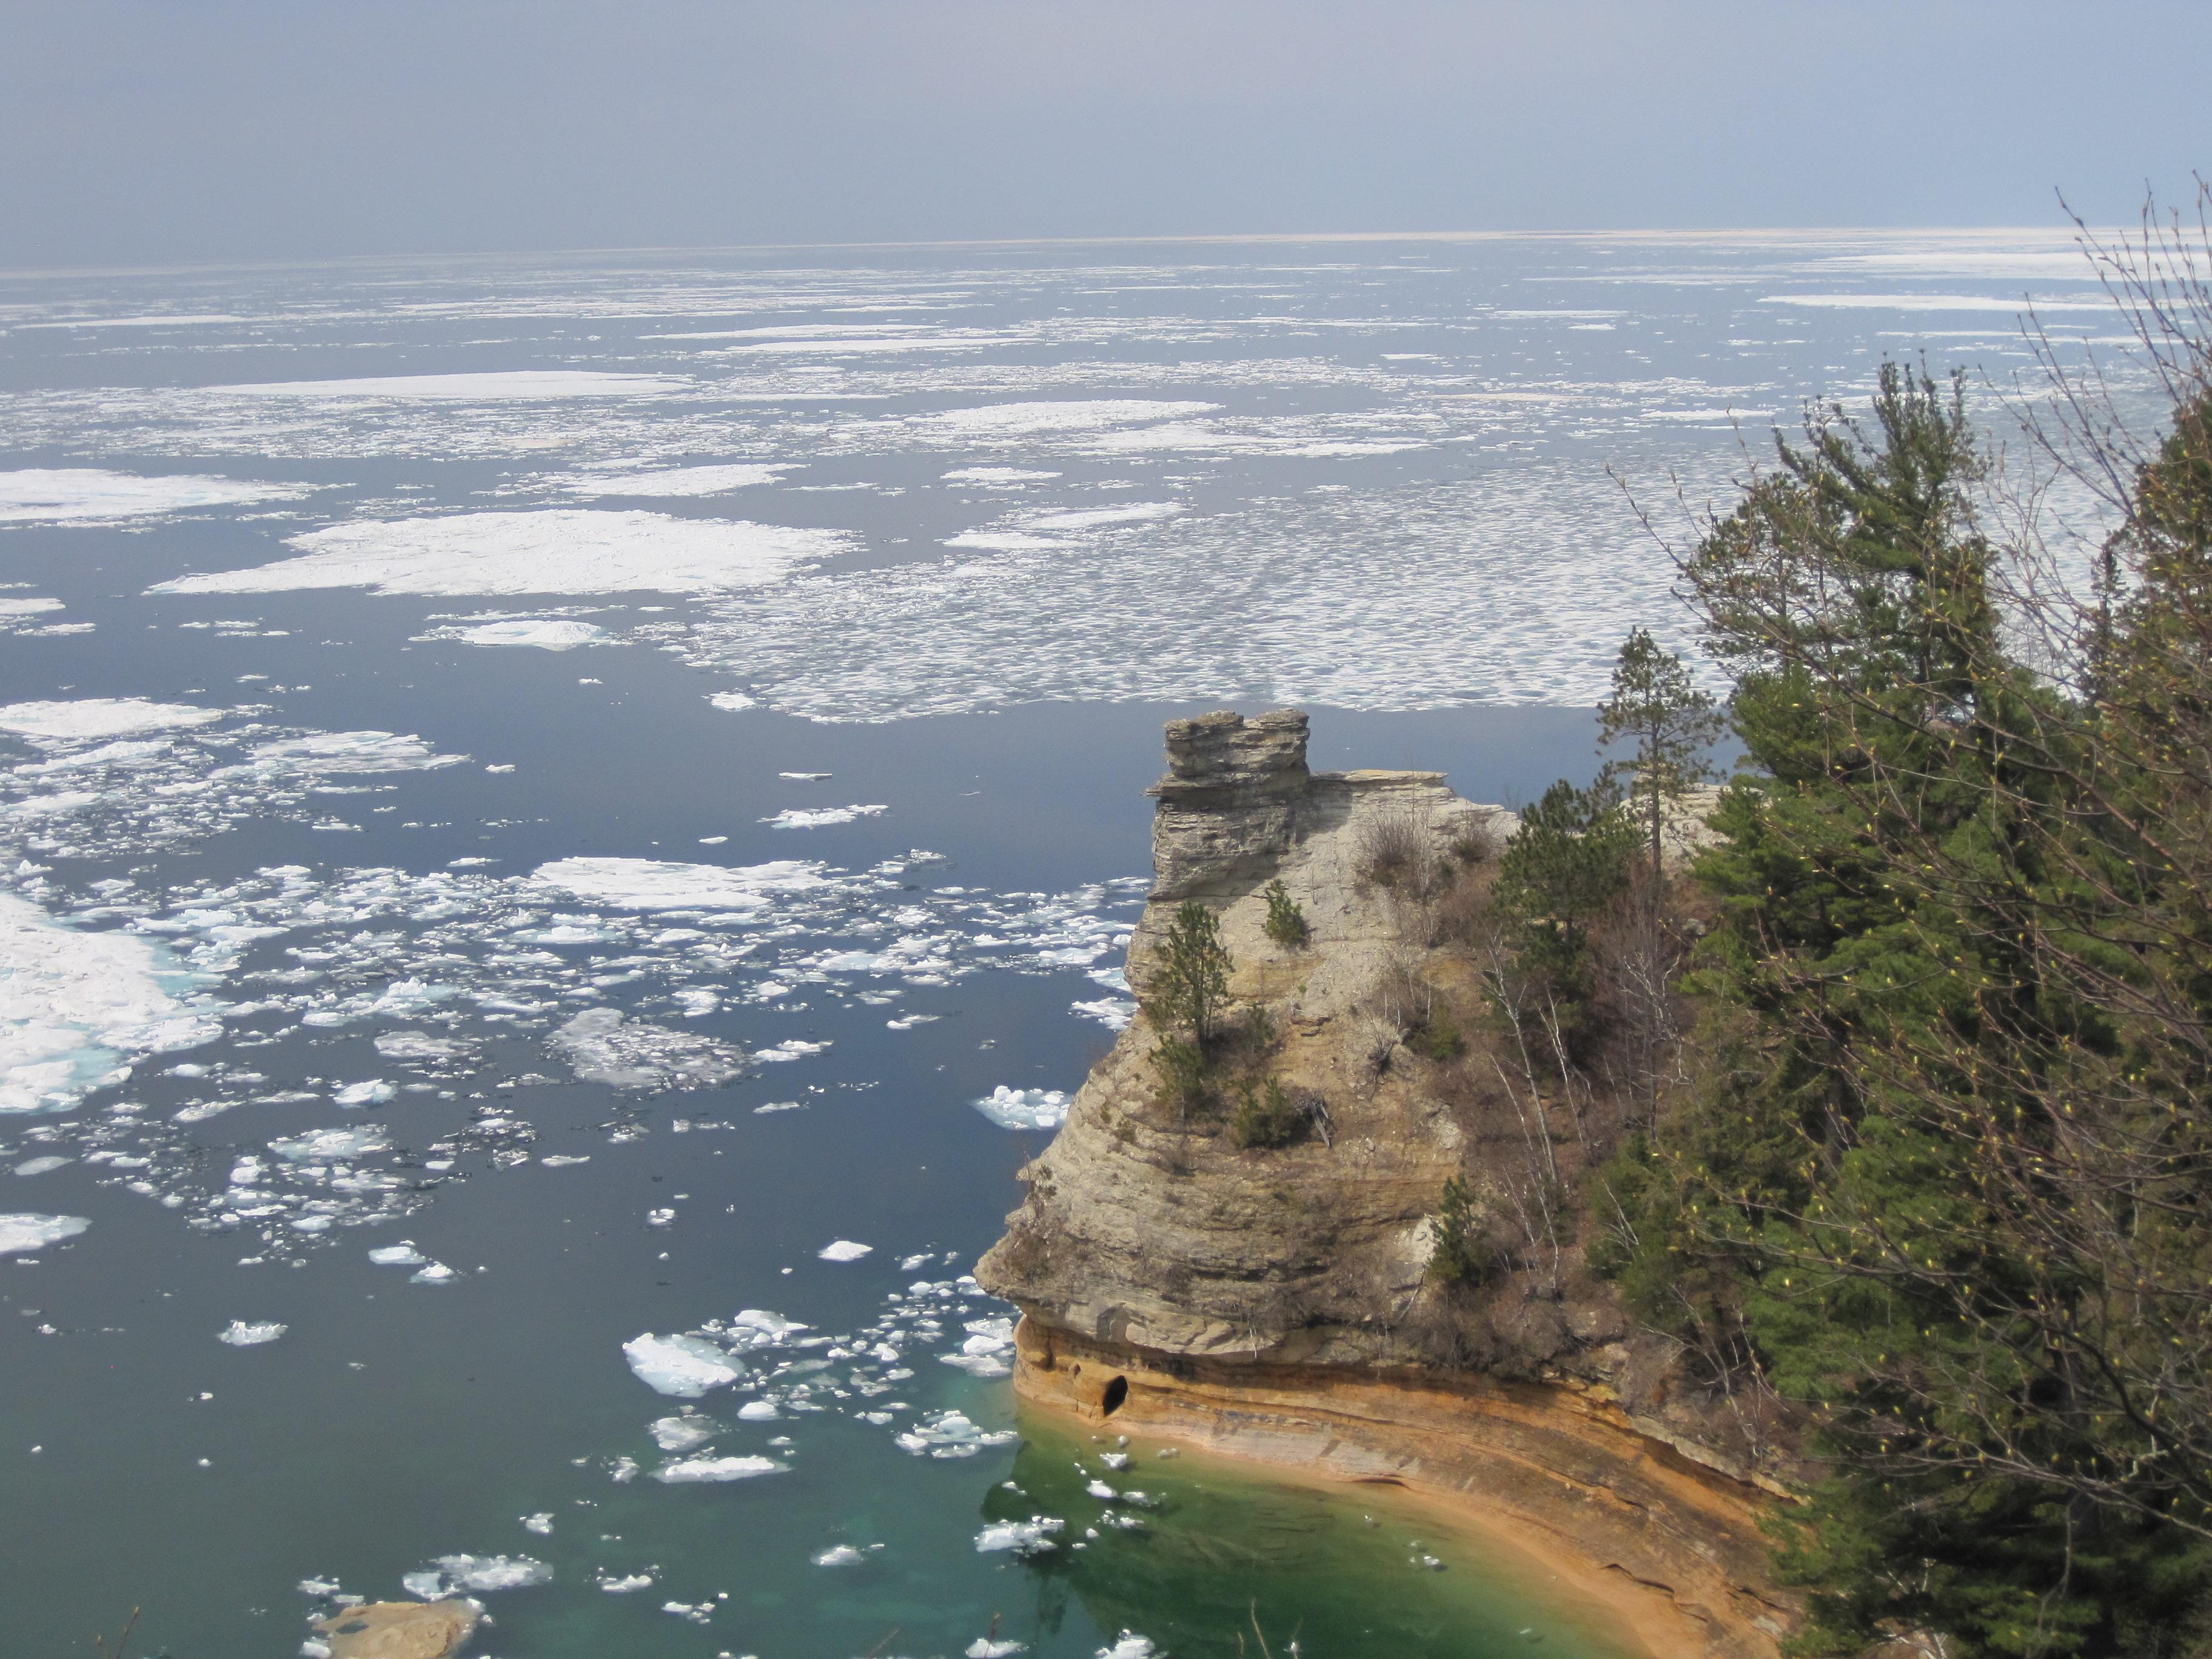 Lake Superior - Pictured Rocks National Lakeshore (U S